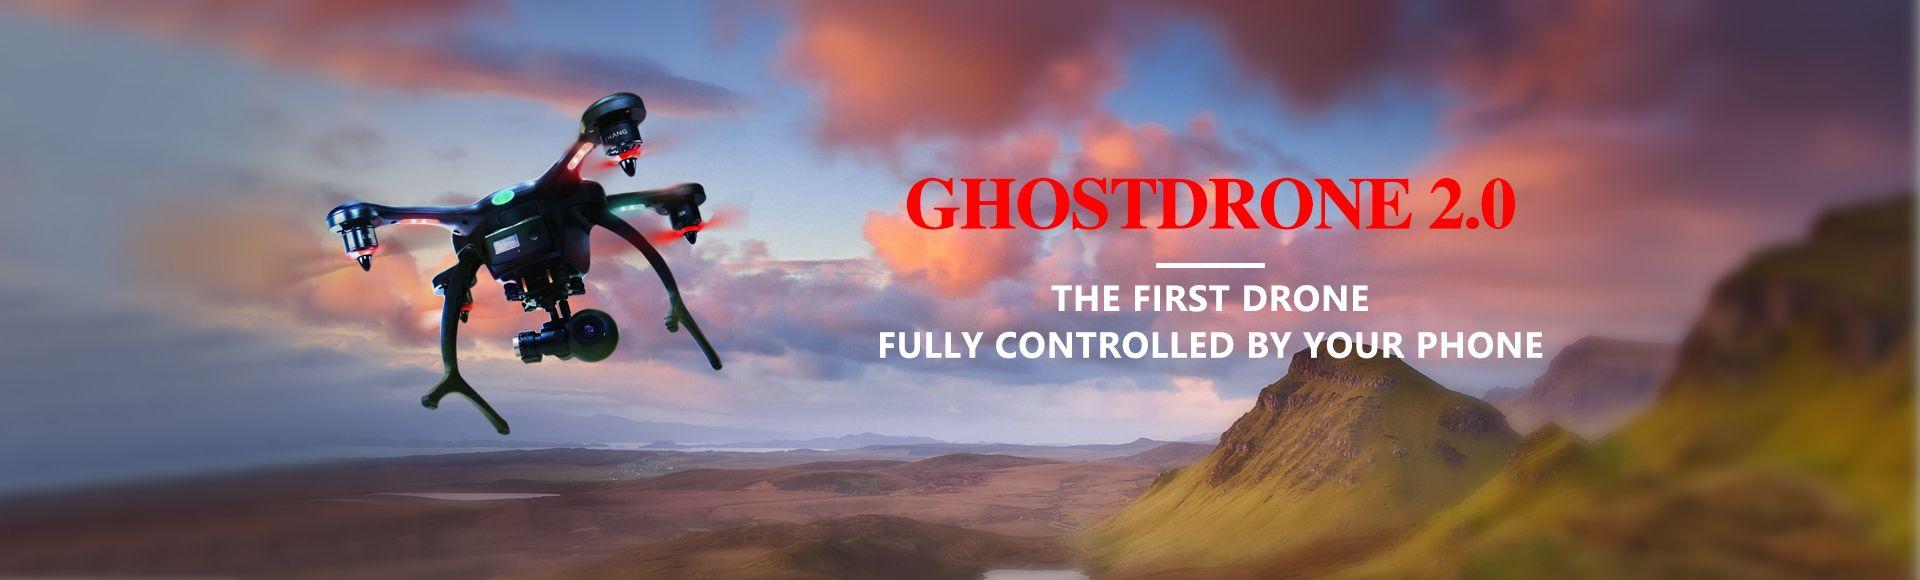 GHOSTDRONE 2.0 STANDARD